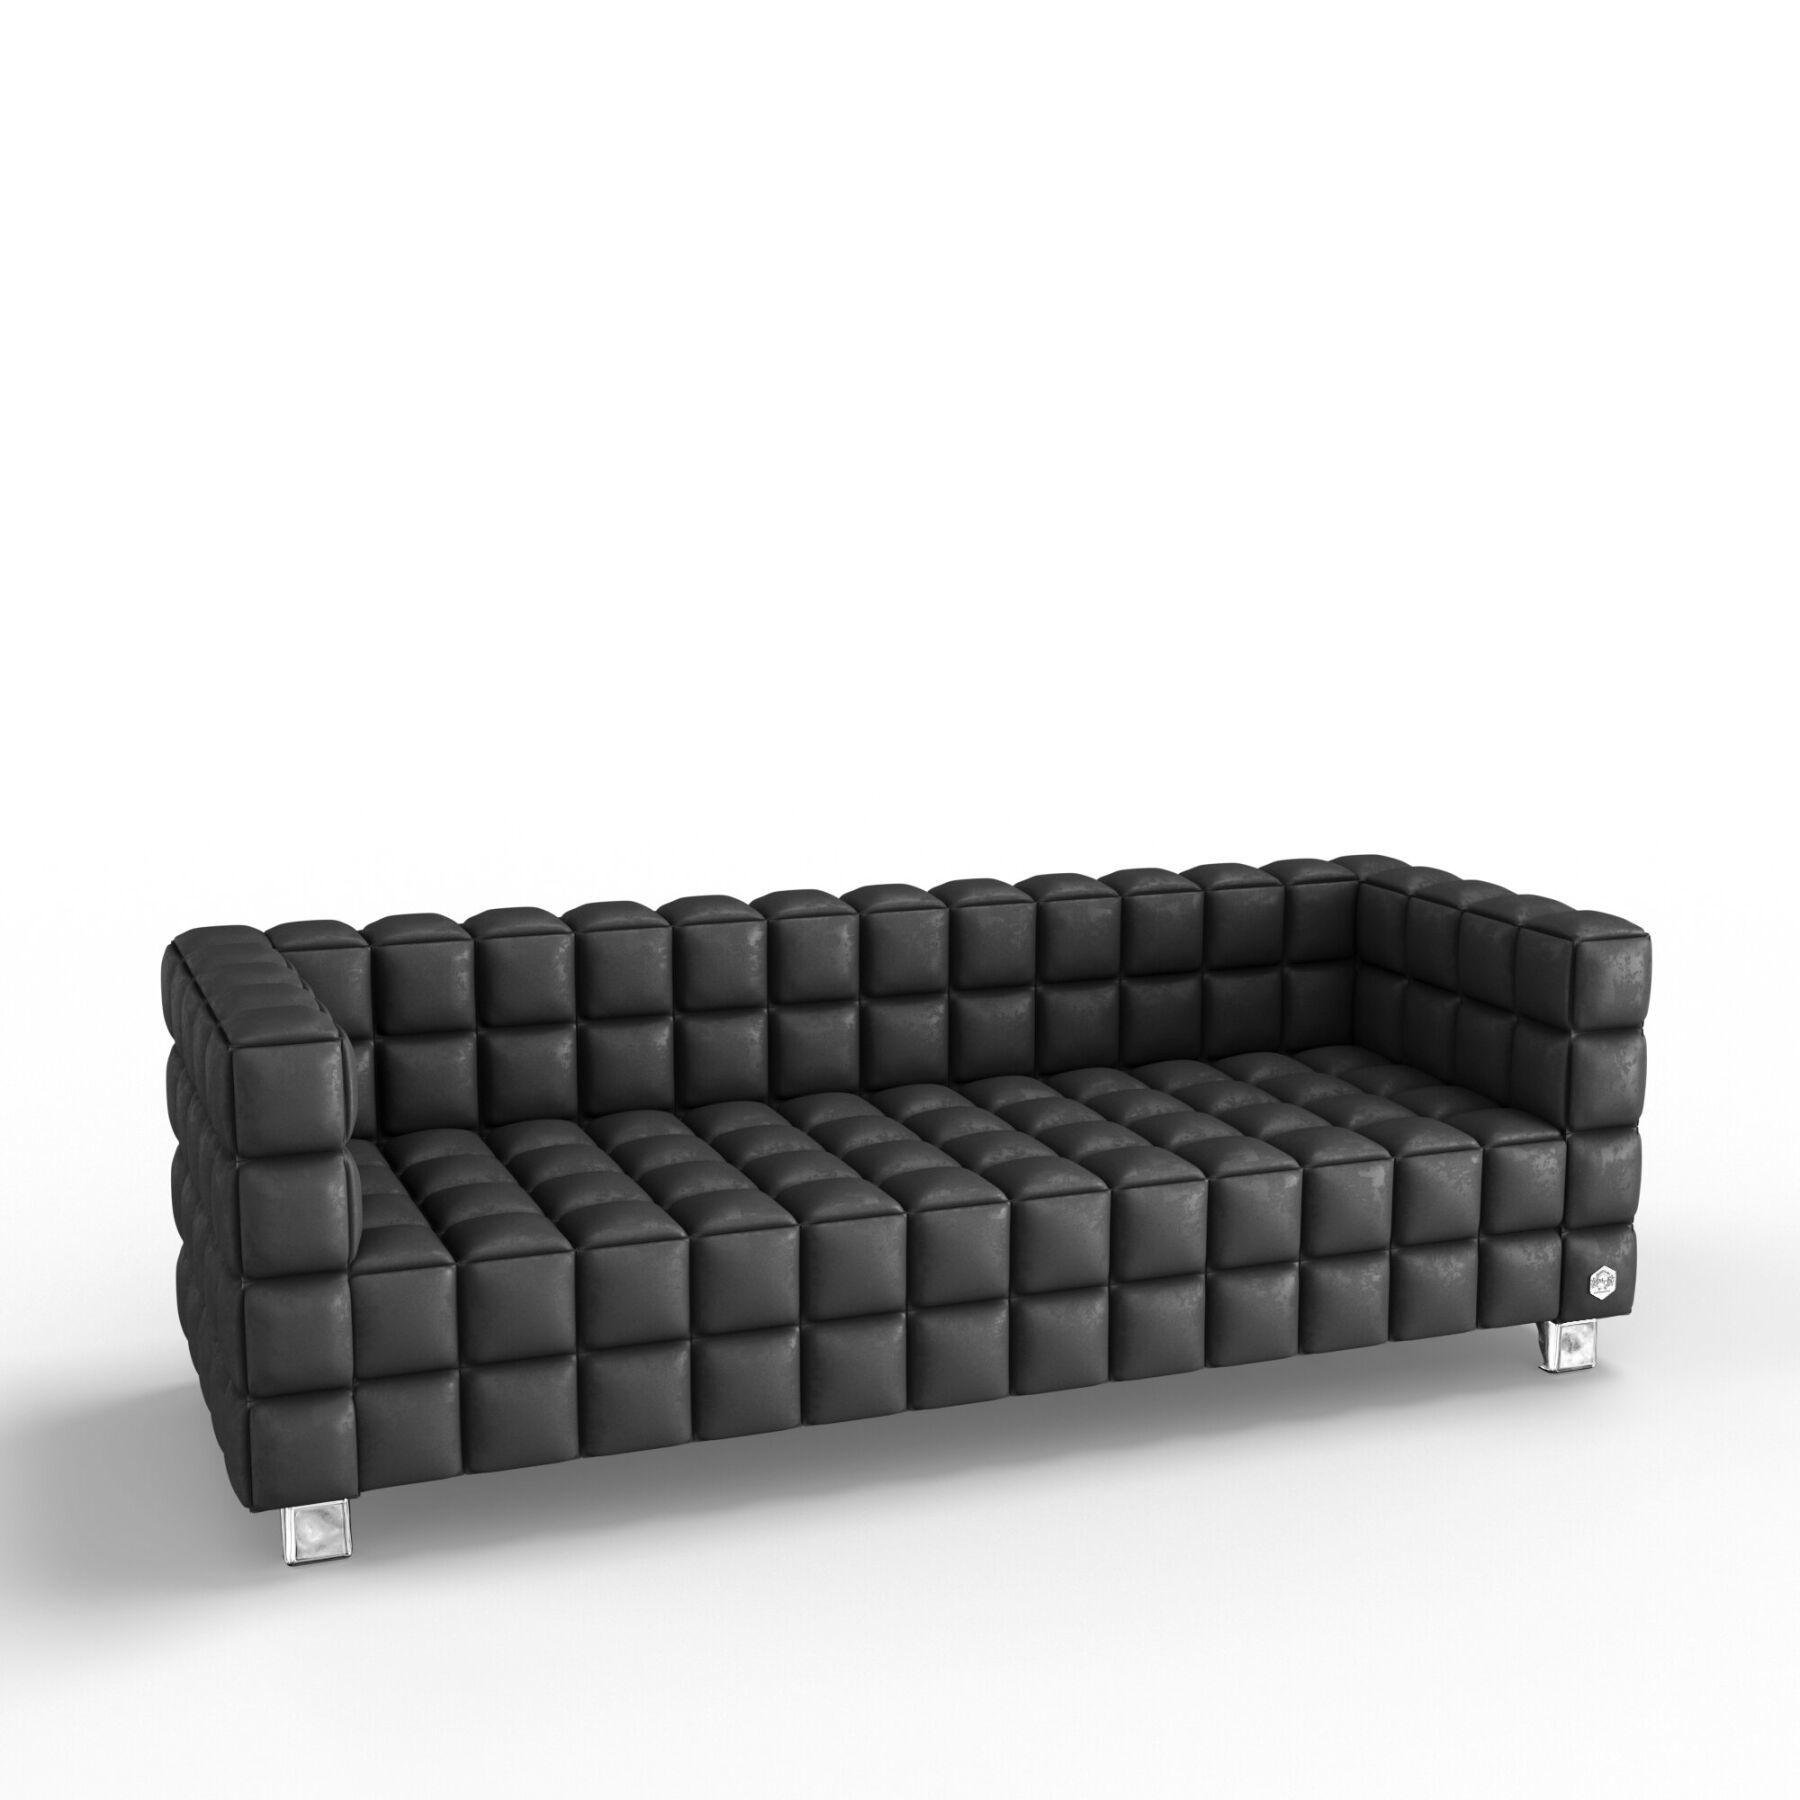 Трехместный диван KULIK SYSTEM NEXUS Антара 3